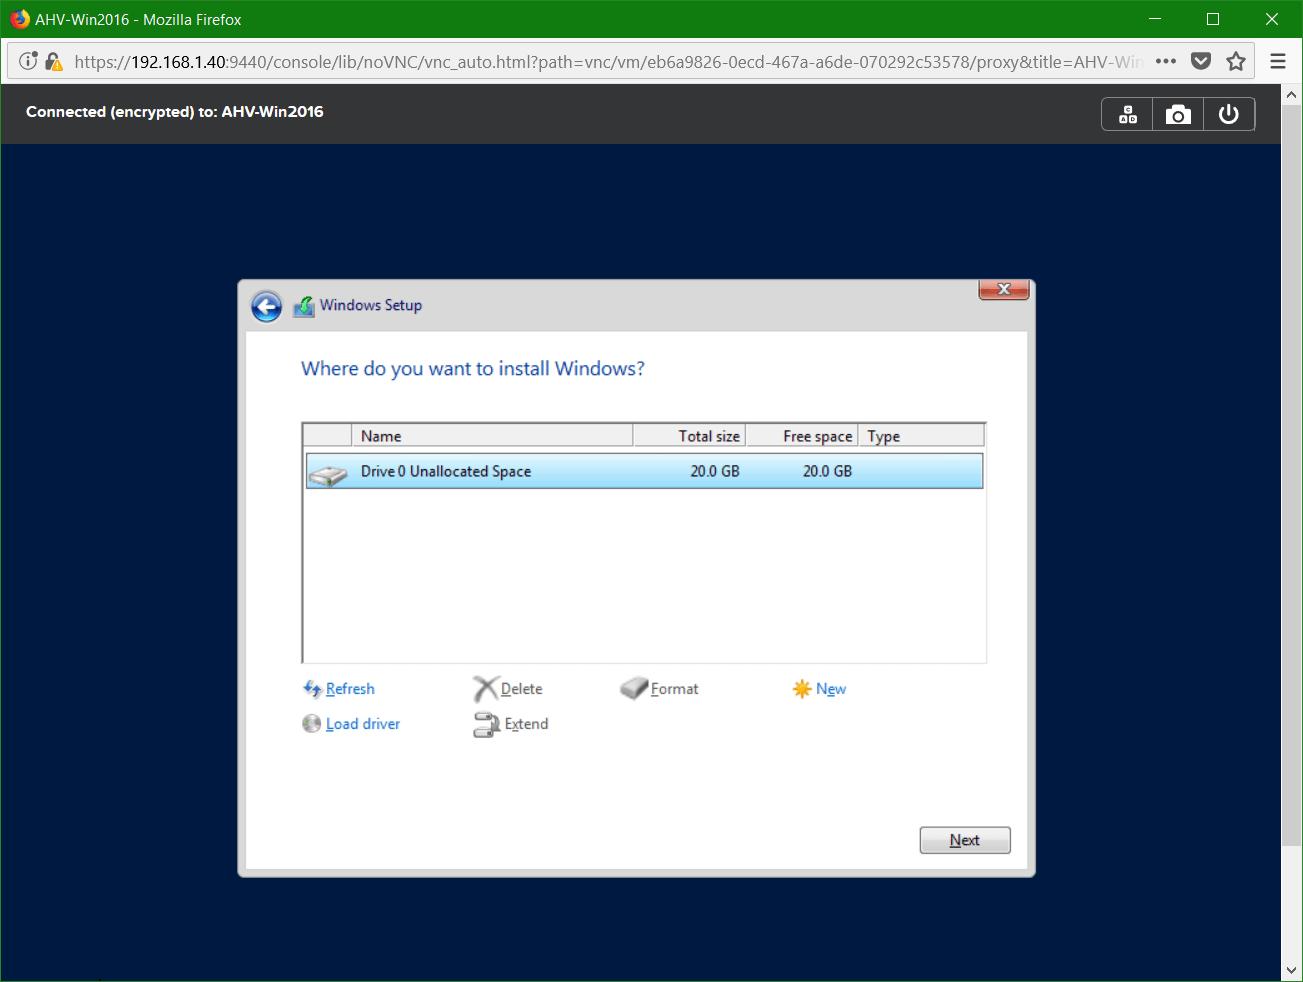 domalab.com Nutanix Windows AHV guest disk